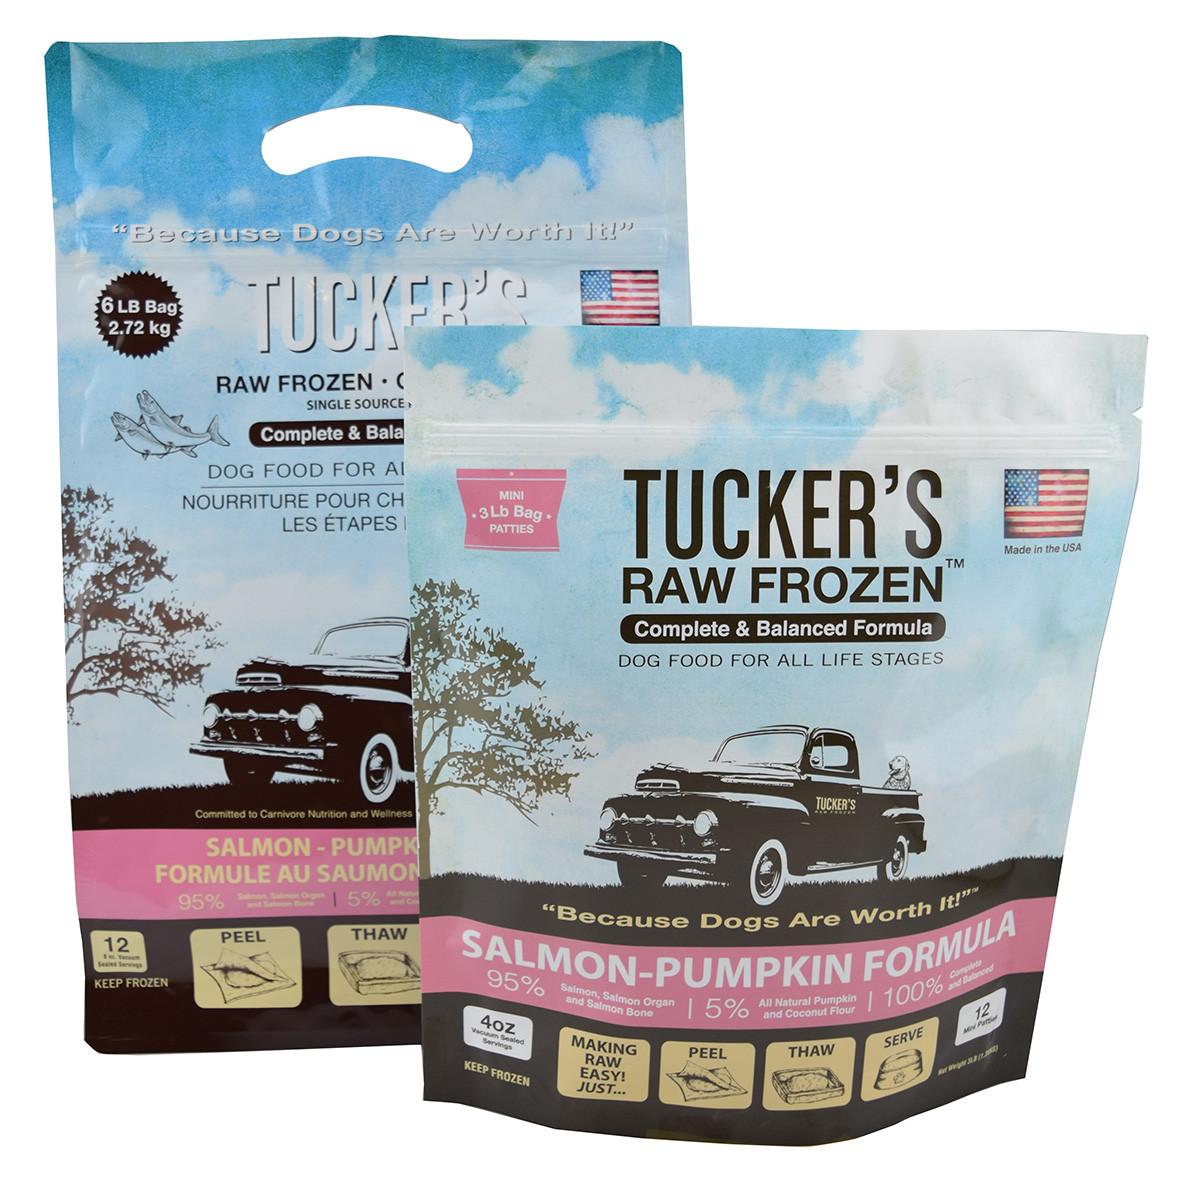 click here to shop Tucker's Raw Frozen Salmon-Pumpkin Formula Dog Food